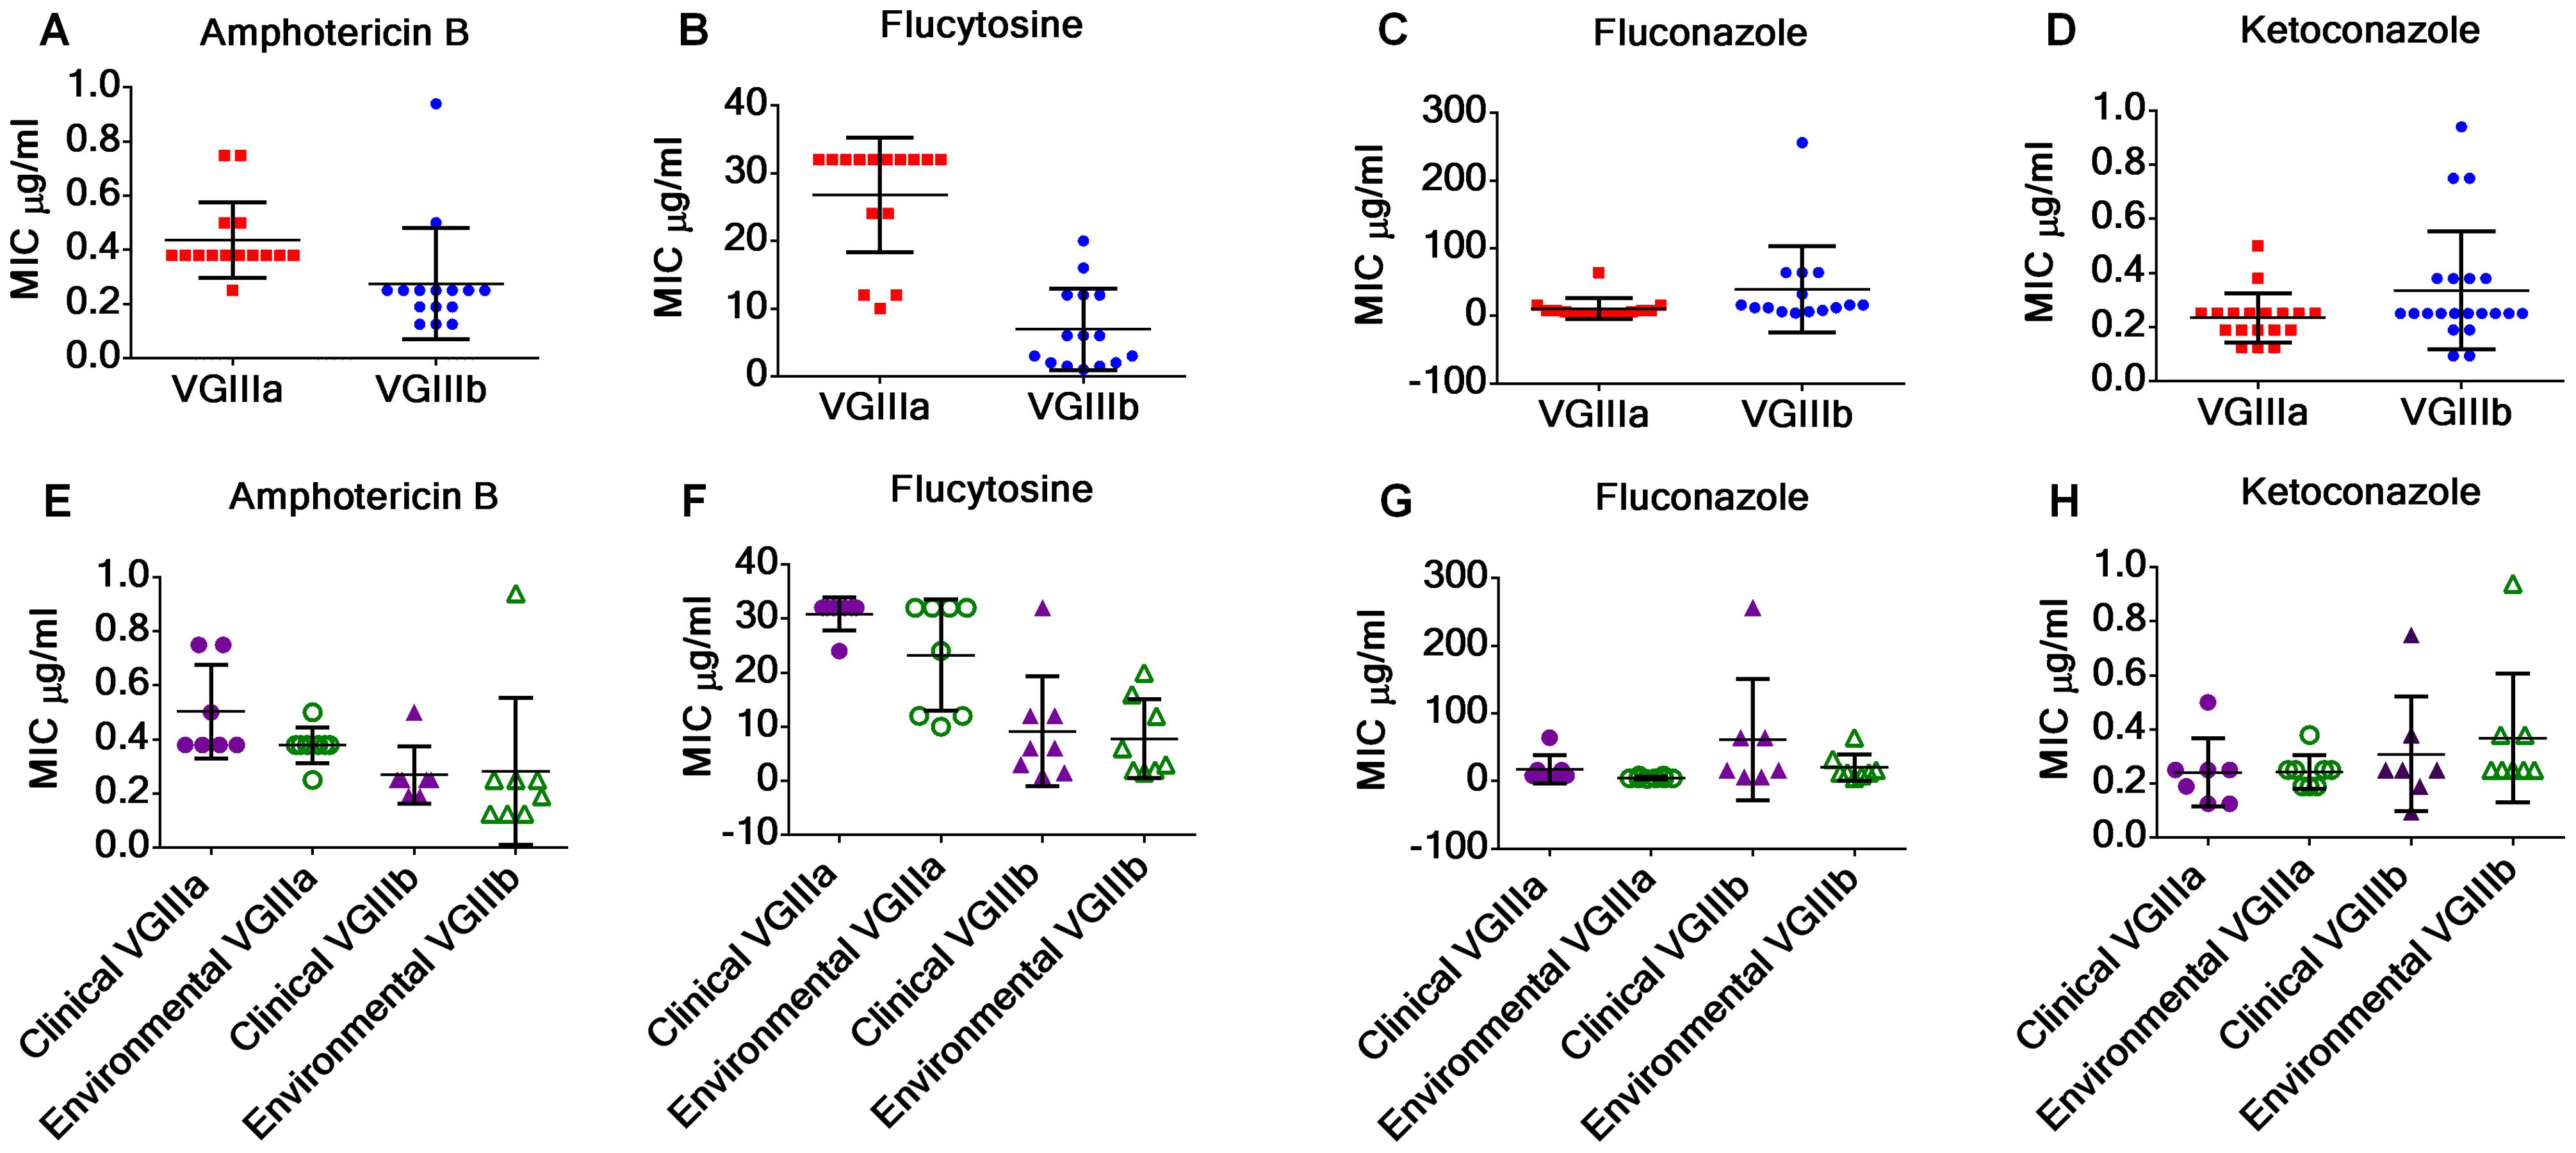 <i>C. gattii</i> VGIIIb isolates display higher antifungal susceptibility values to Amphotericin B and flucytosine in contrast to VGIIIa isolates.